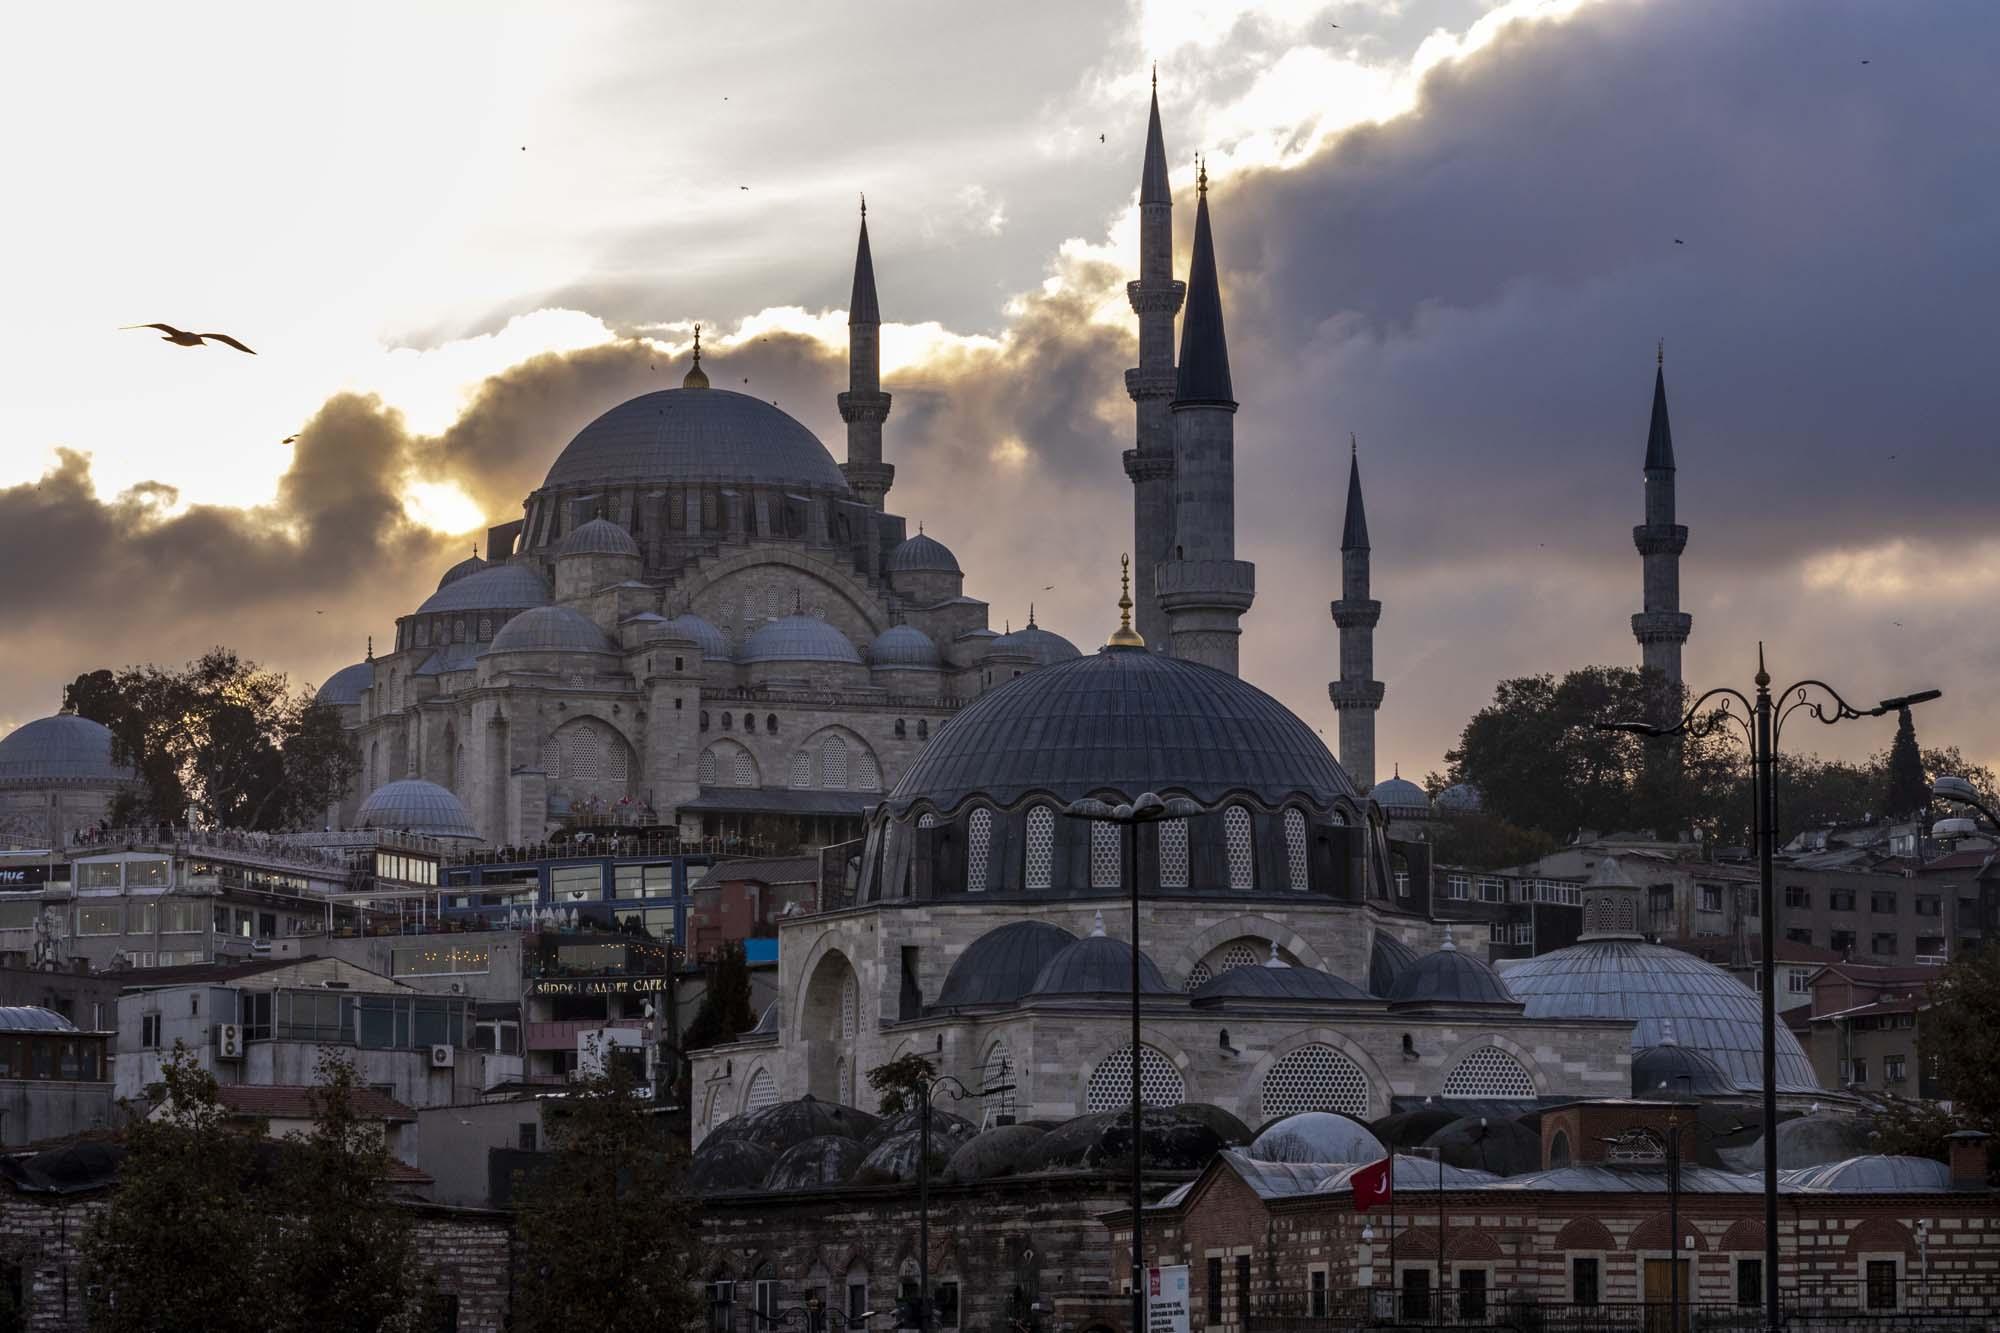 Süleymaniye Camii dans la ville d'İstanbul en Turquie